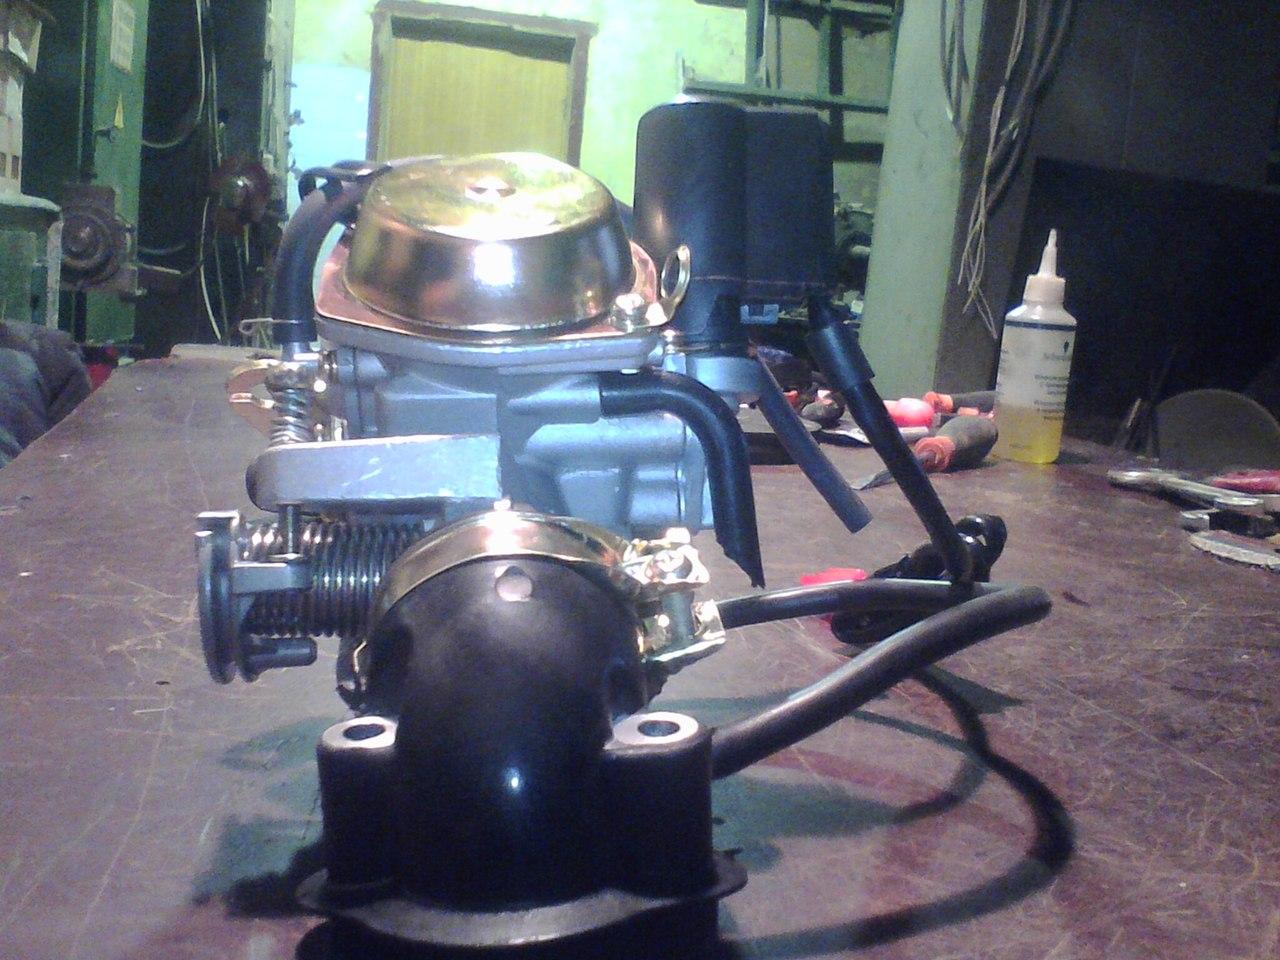 Тюнинга мотоциклов DPVbCo0Zz2c